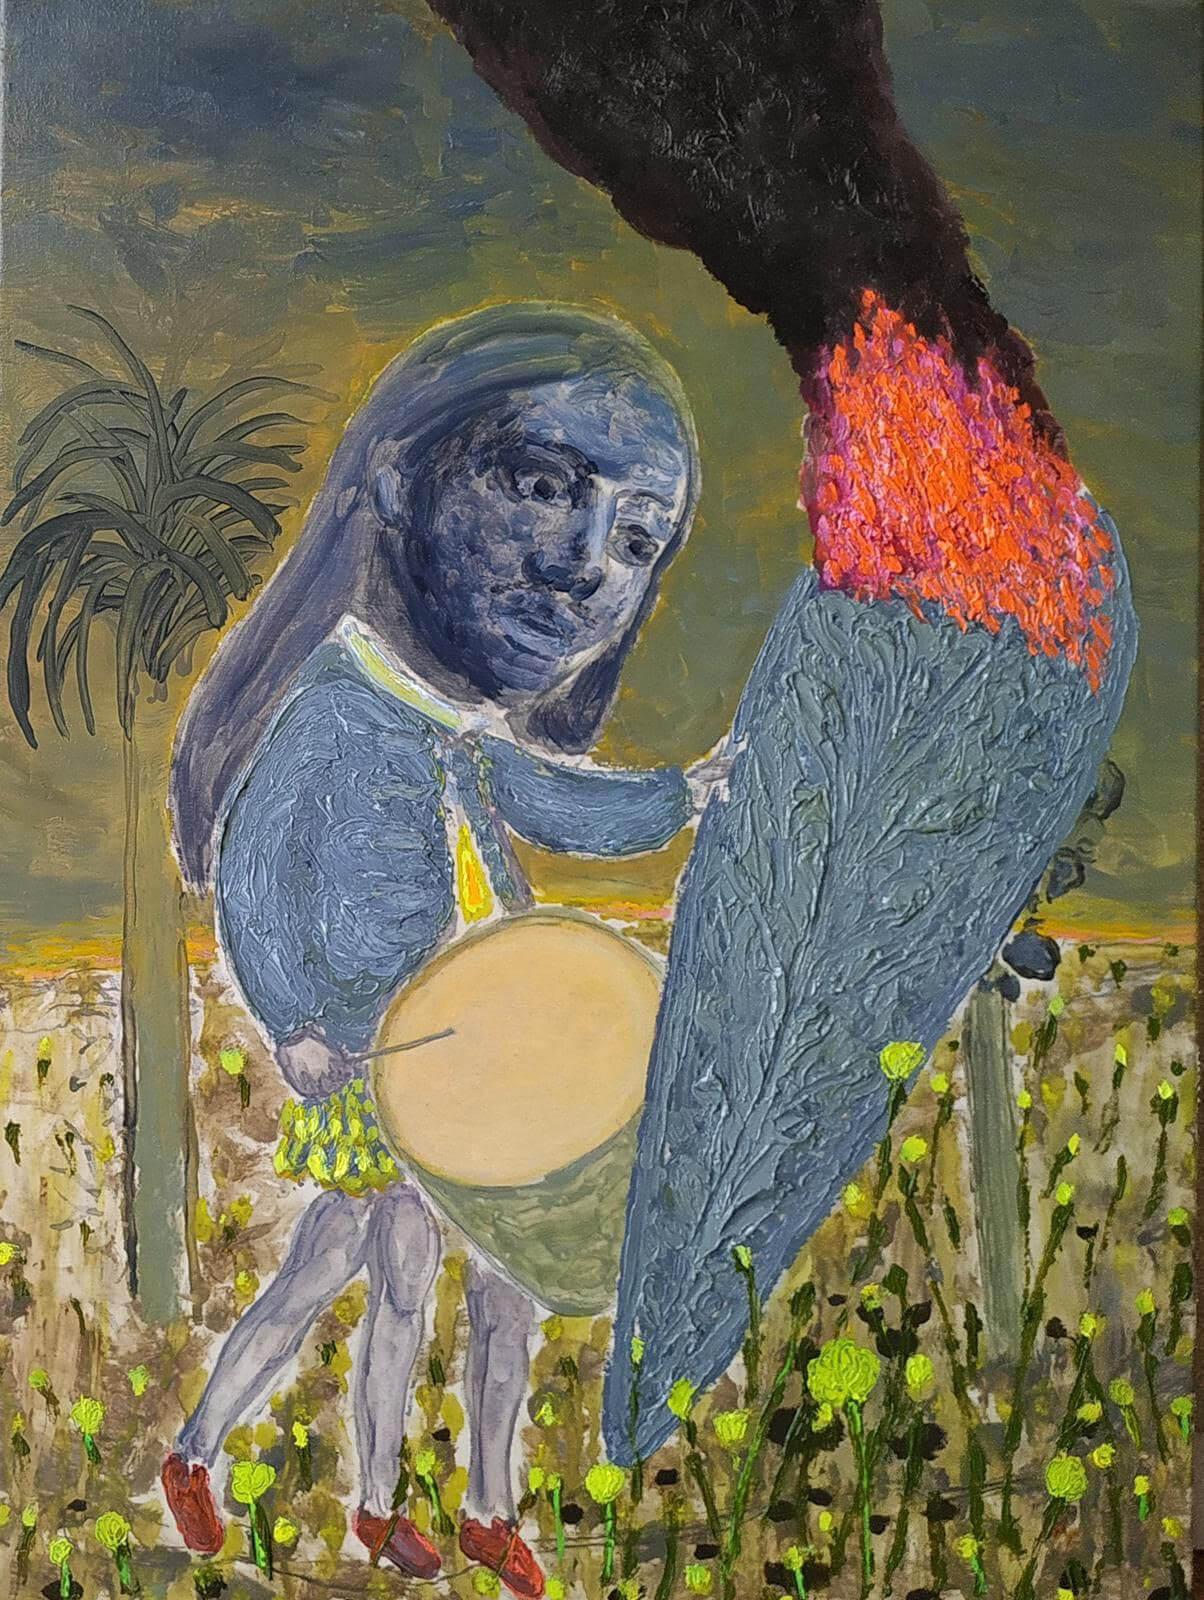 GRGUR AKRAP - Lažni prorok / False oracle, 2021. ulje i enkaustika na platnu / oil and encaustics on canvas 153x108 cm